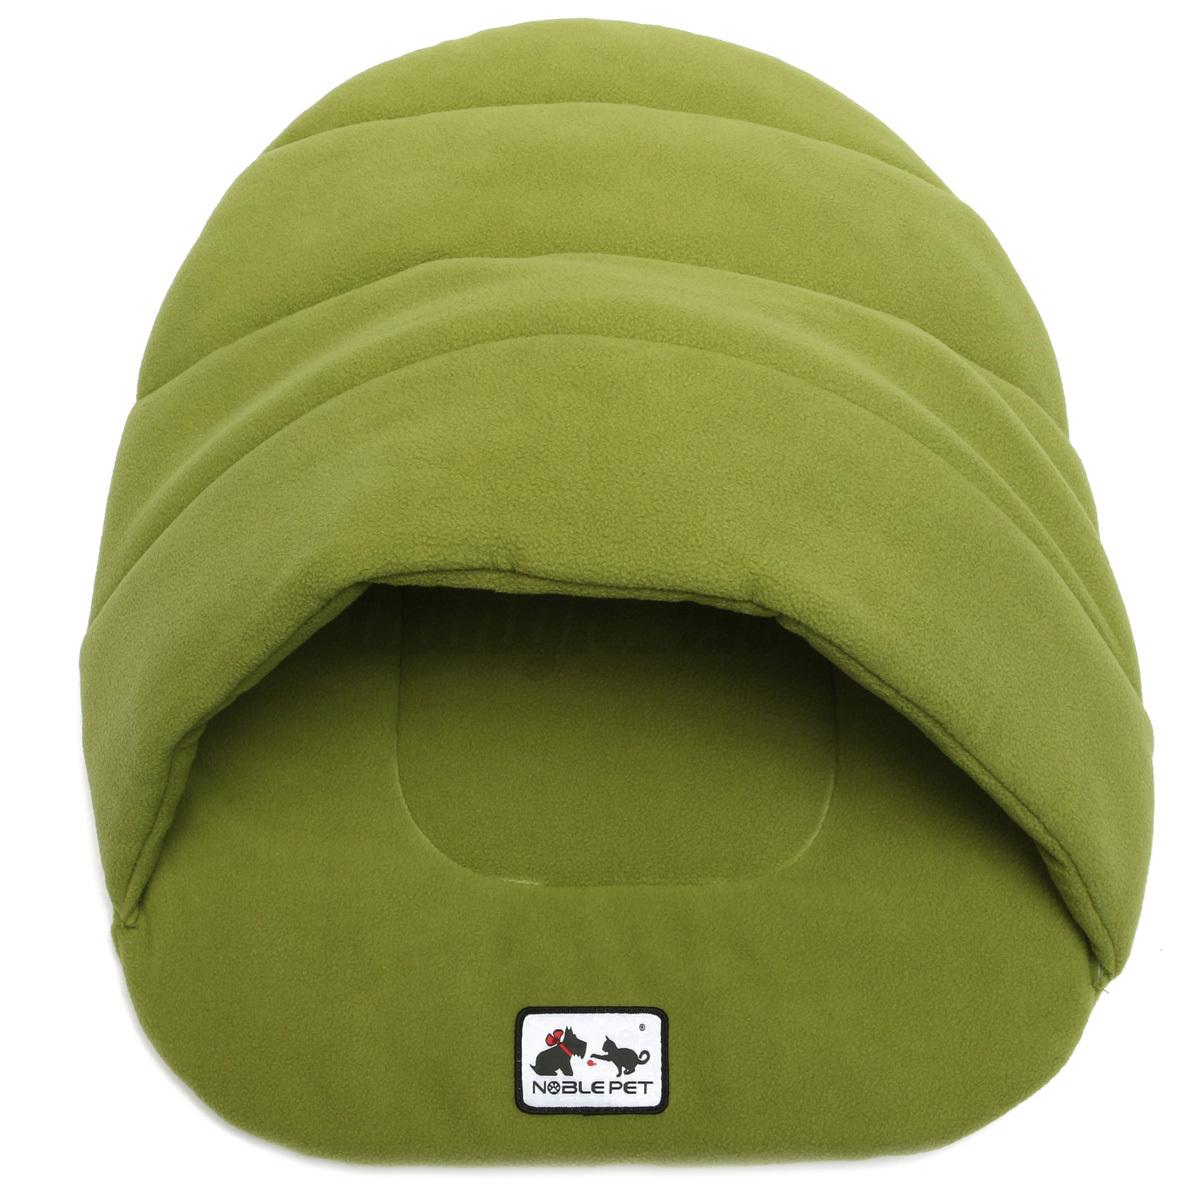 tapis coussin lit sac de couchage fleece velours pour chien chat animaux dog bed ebay. Black Bedroom Furniture Sets. Home Design Ideas